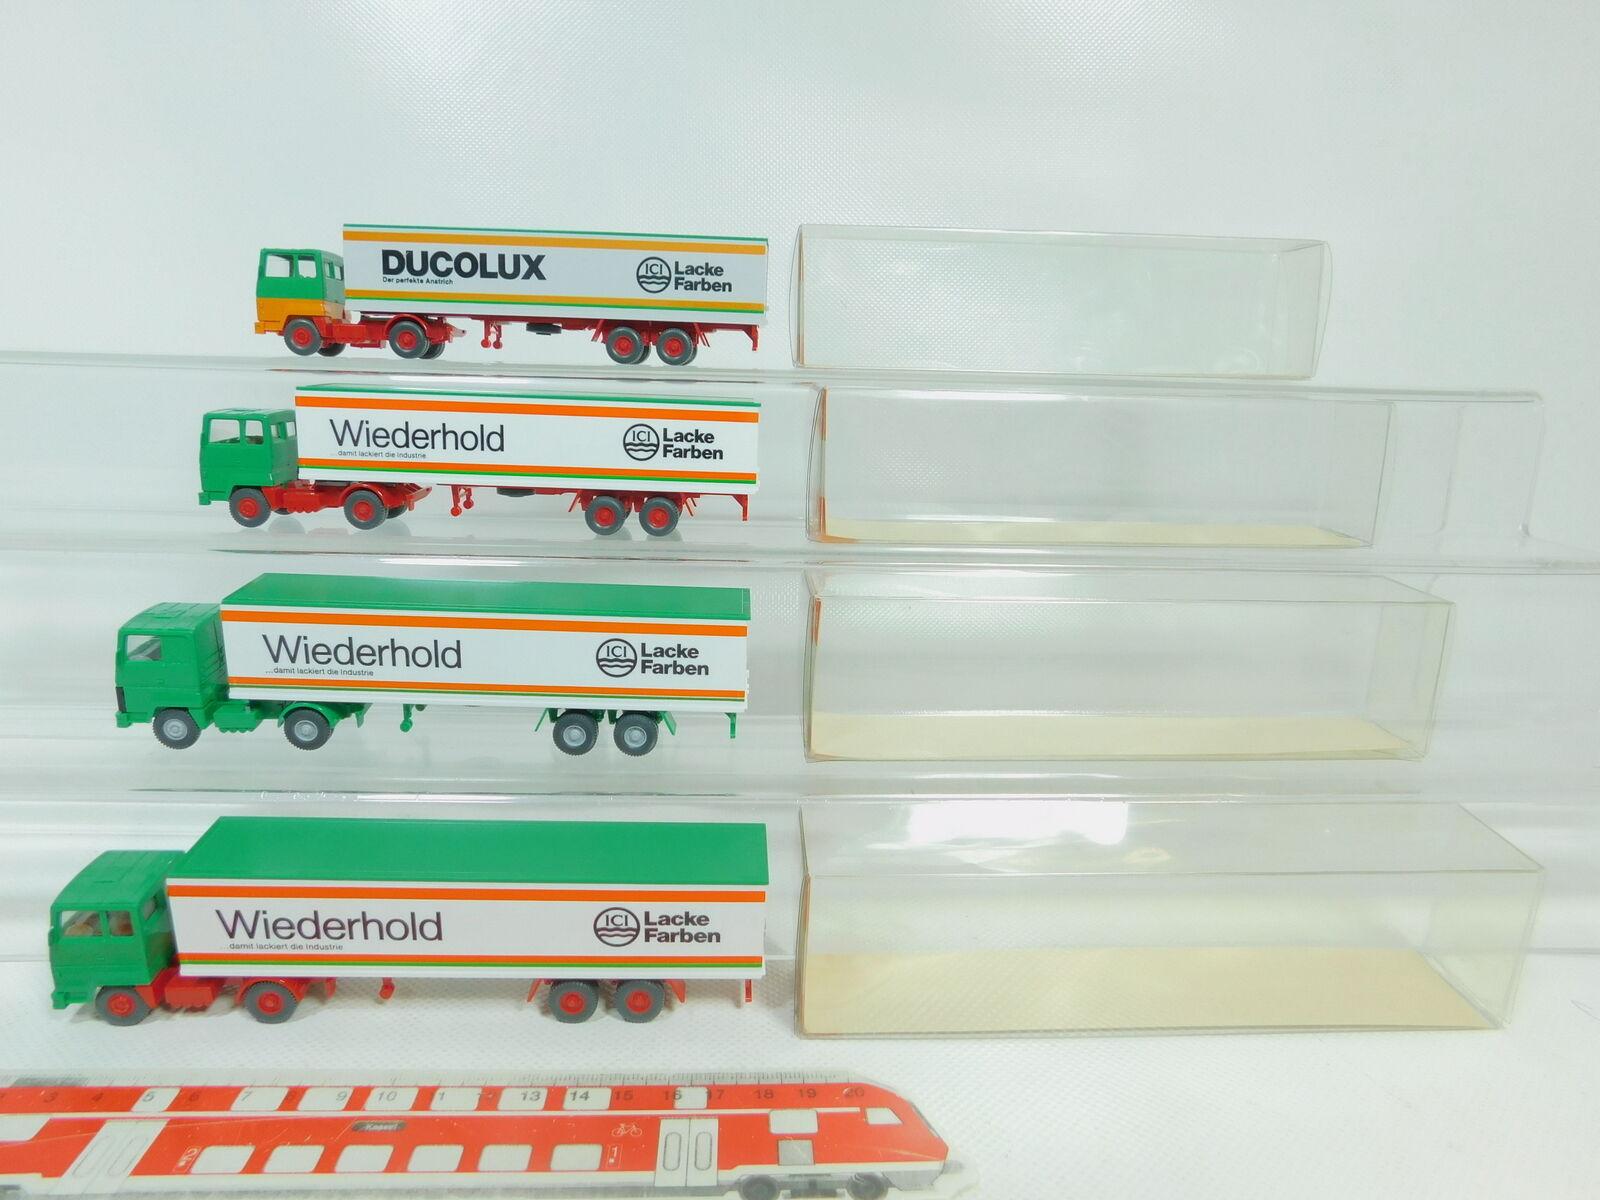 BO671-0,5 x Wiking H0   1 87 87 87 540 Lorry Ford Ici  Wiederhold + Ducolux,VG+ Box 90b1ca